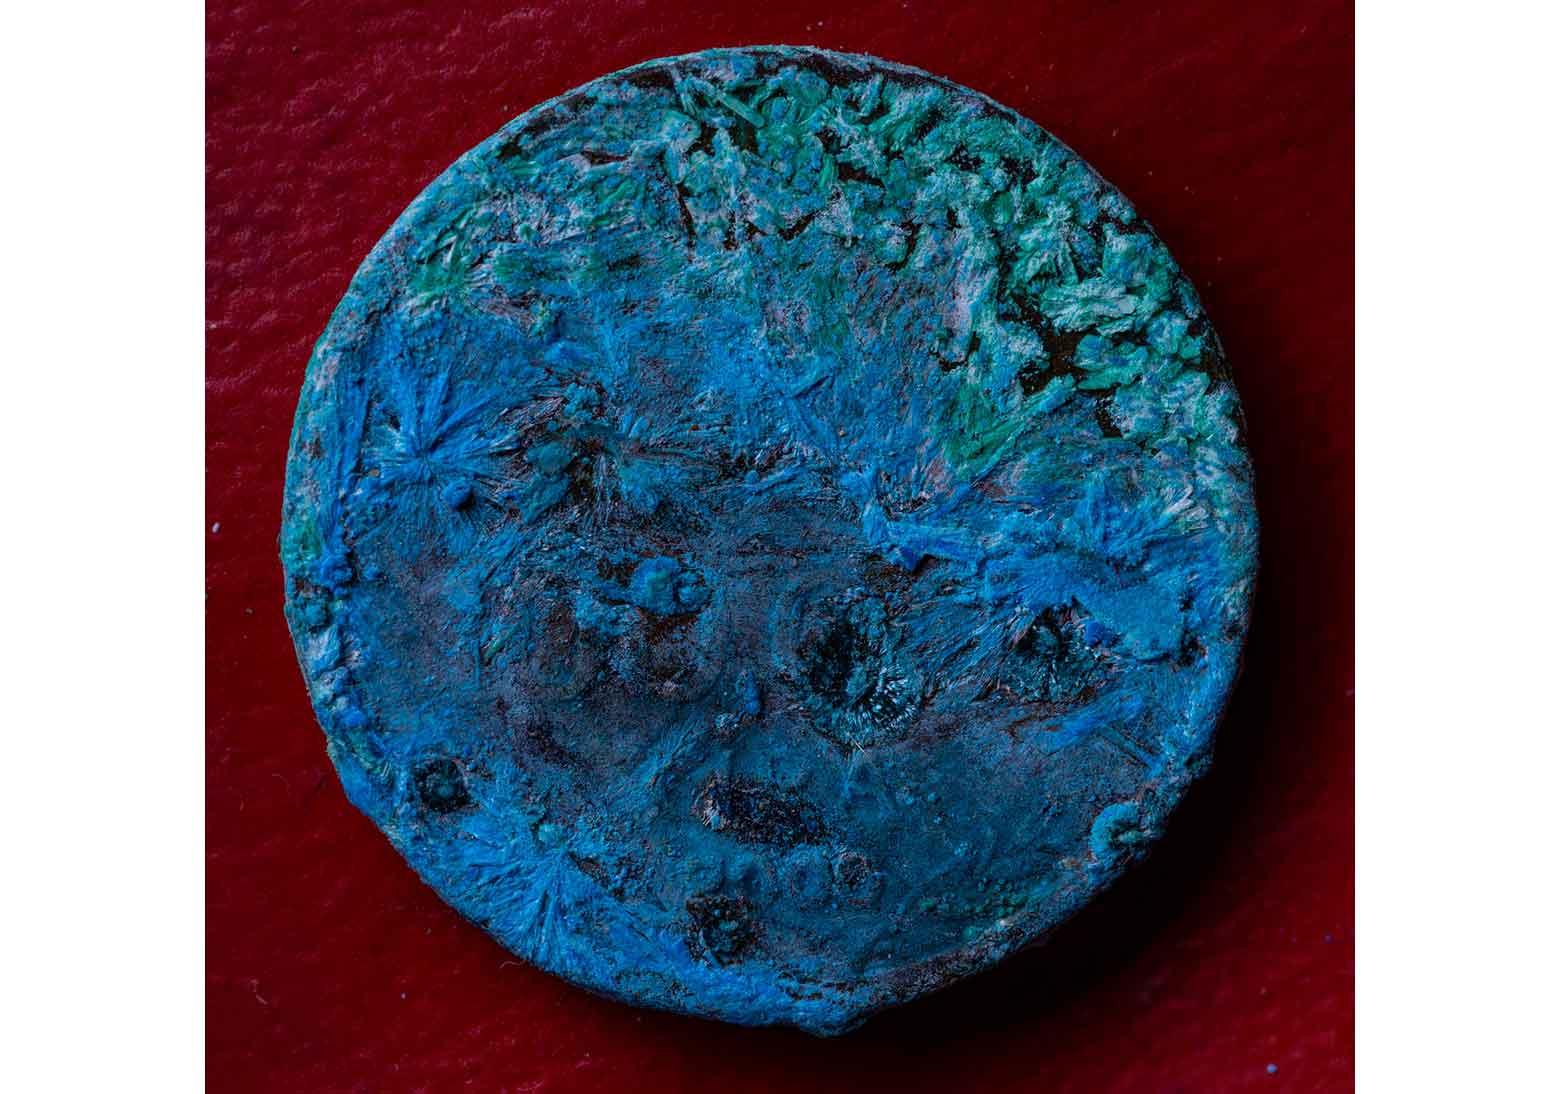 Mavi Para / Blue Coin2016Aluminyum Kompozit Üzerine Hahnemühle Lustre Pigment Baskı